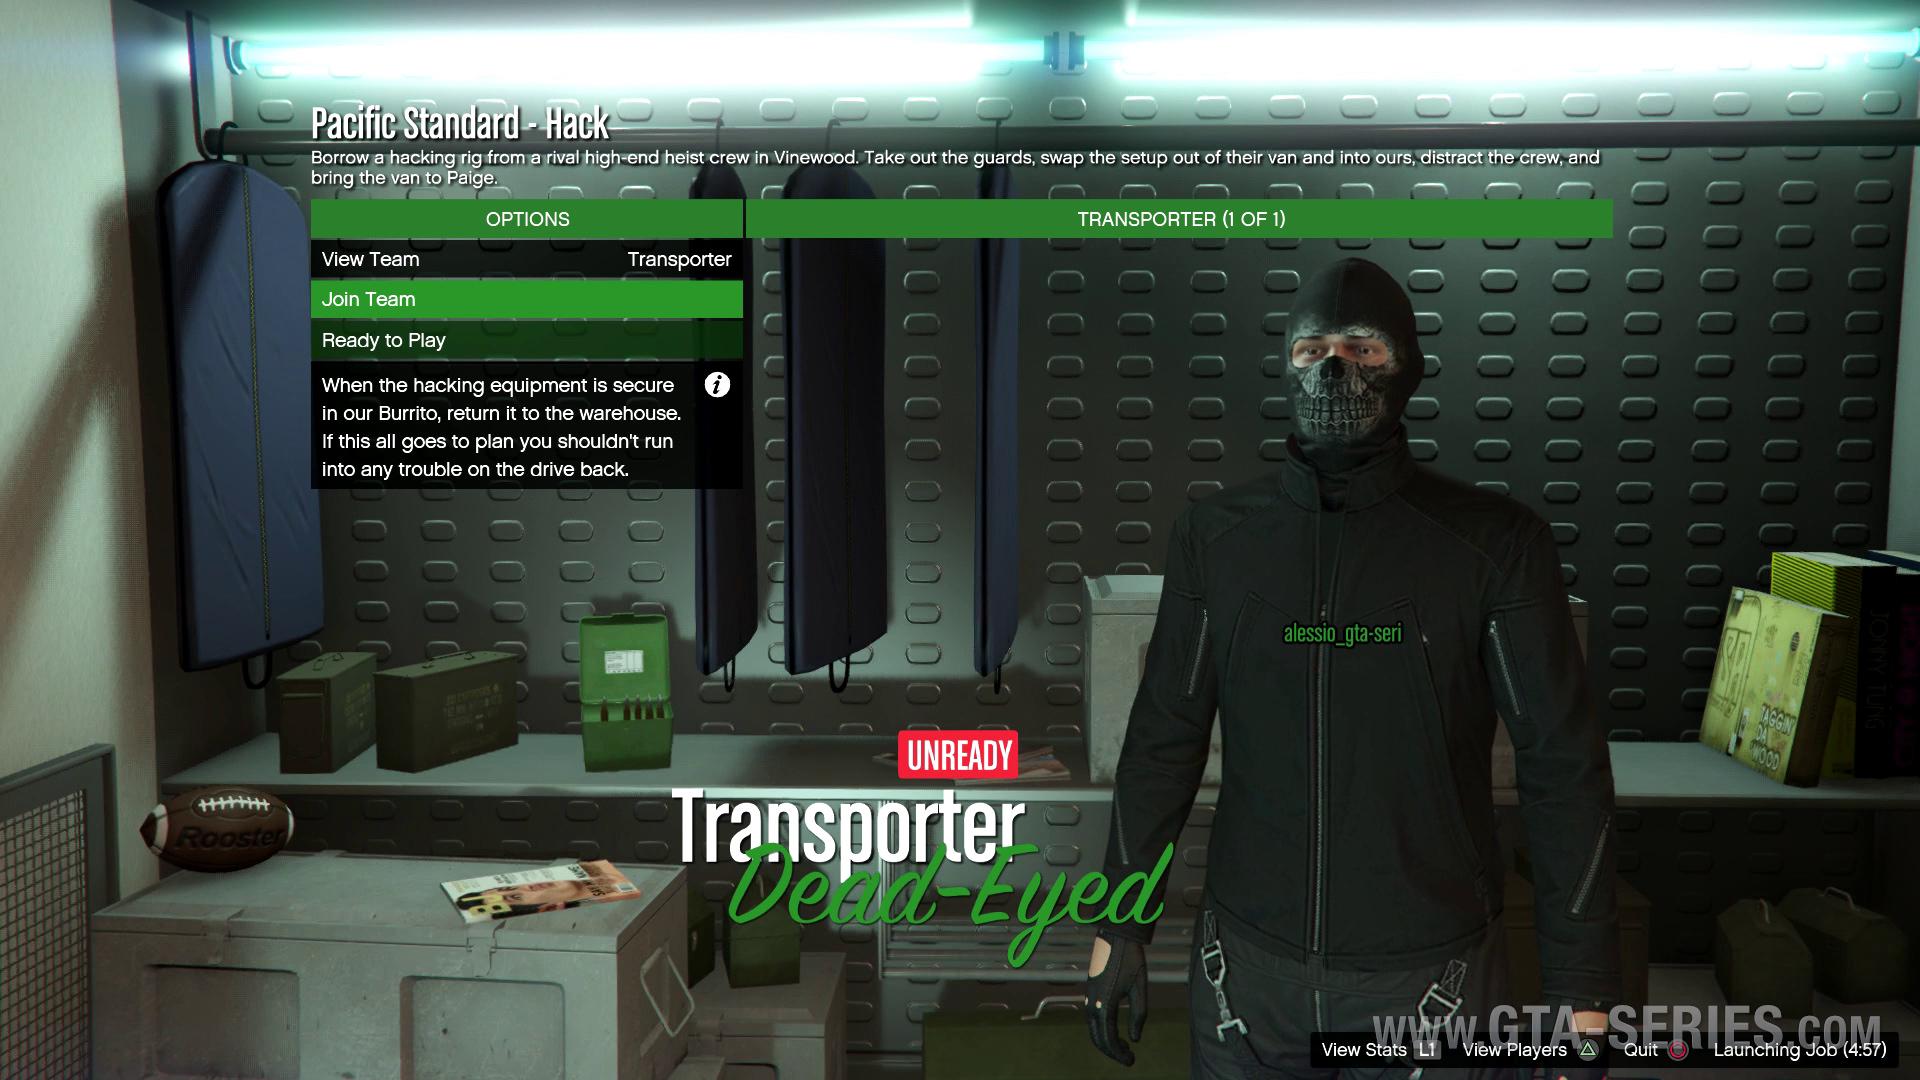 gta online pacific standard hacker